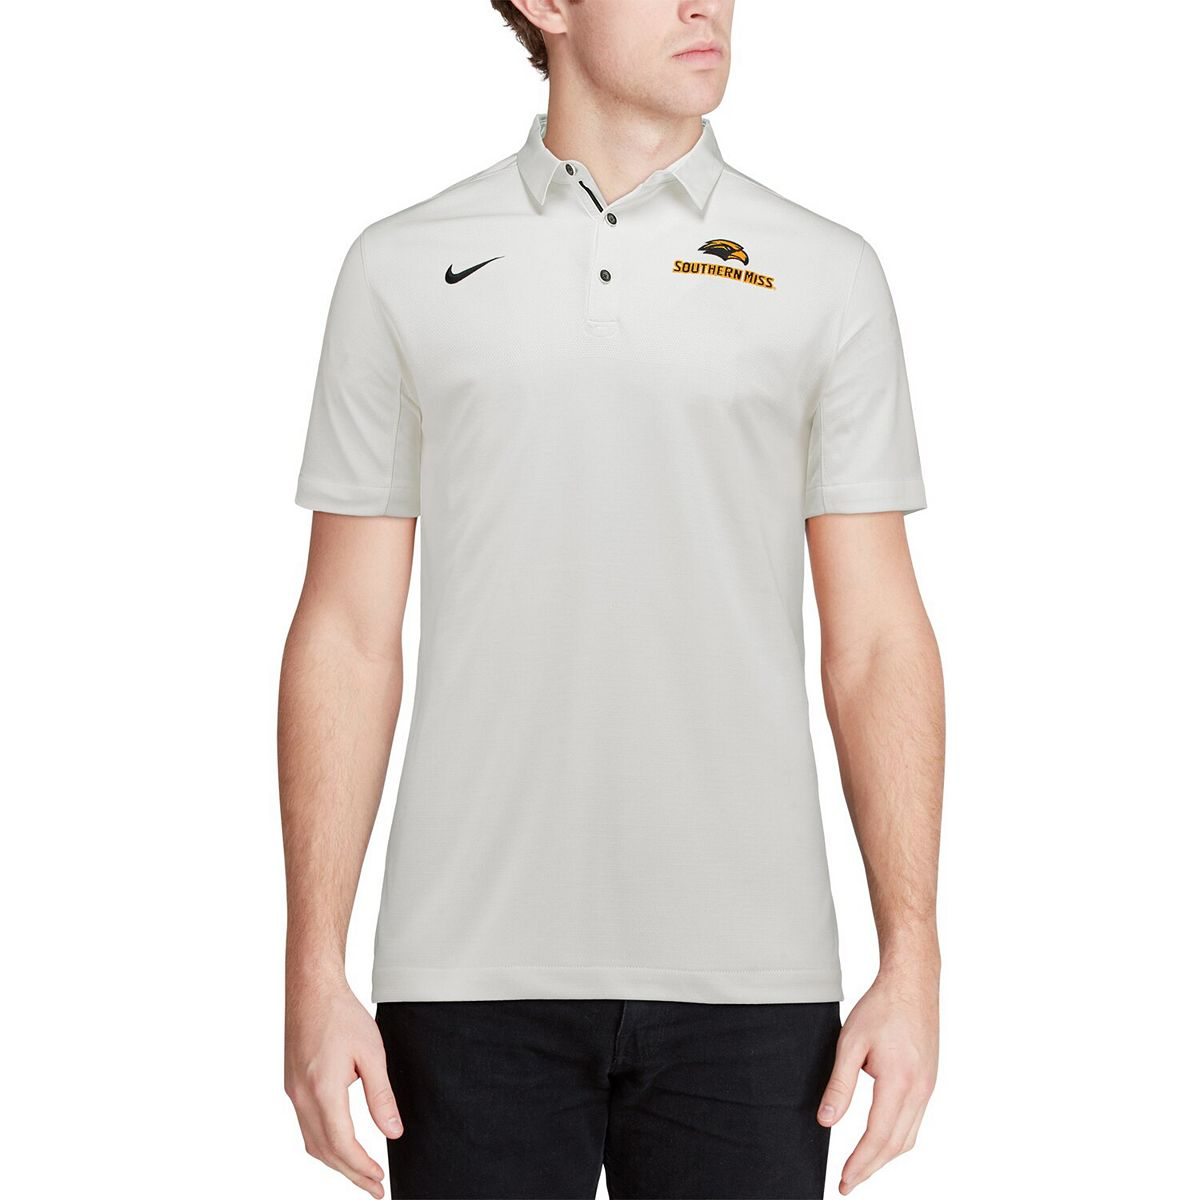 Men's Nike White Southern Miss Golden Eagles 2017 Coaches Sideline Dry Elite Performance Polo y7yVX